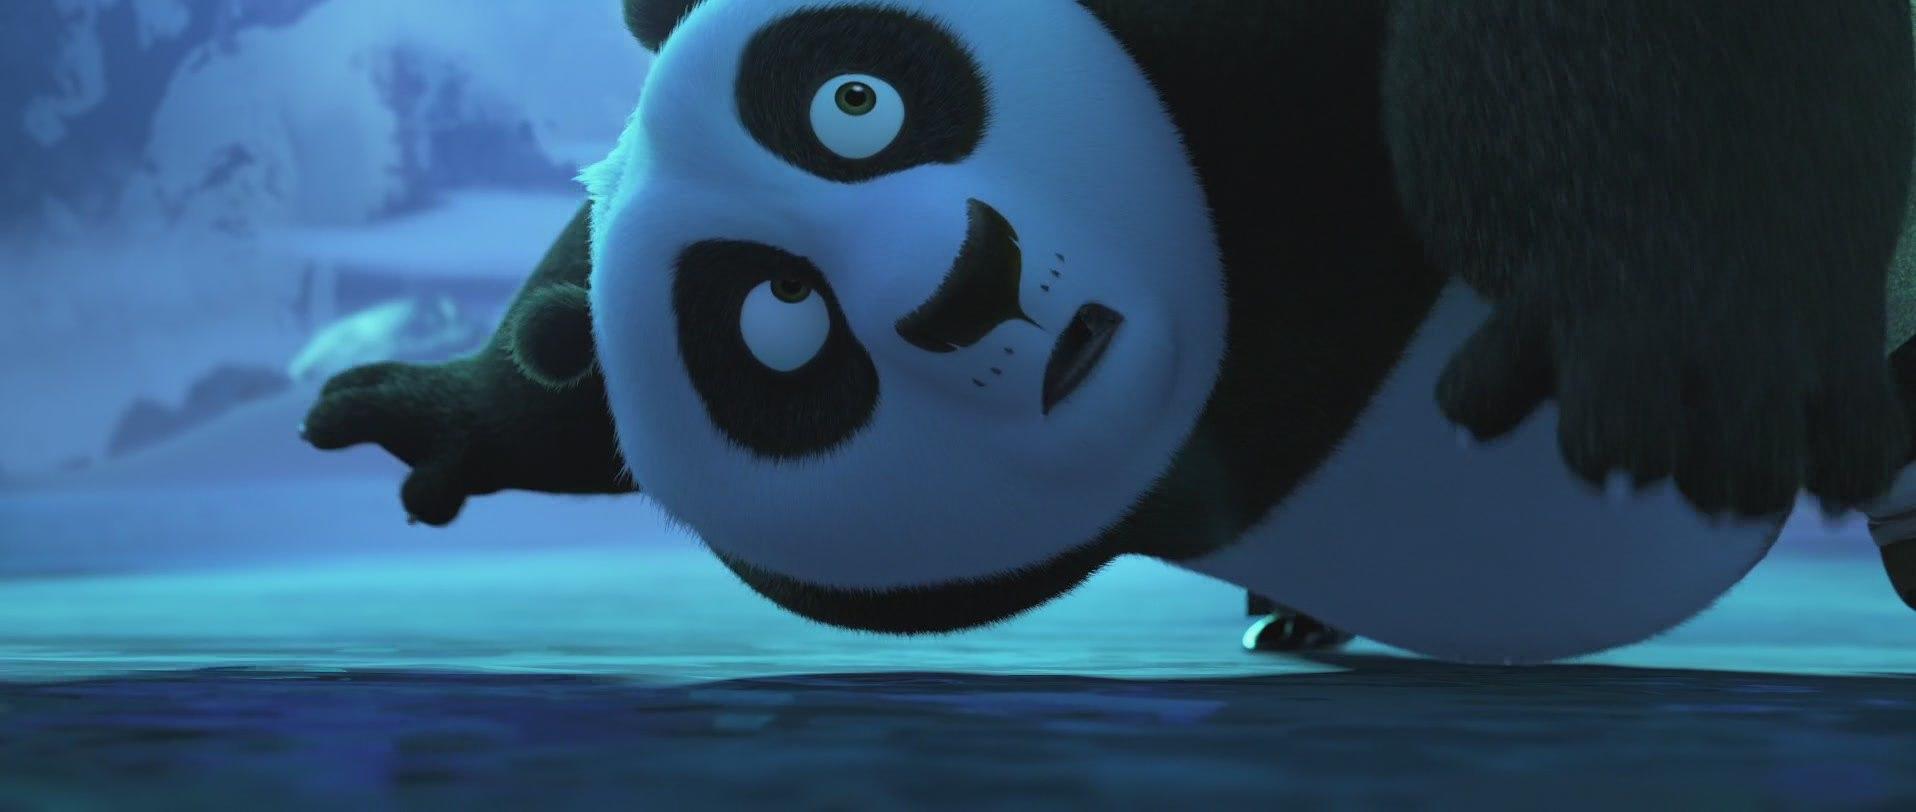 панда кунг-фу удивлена